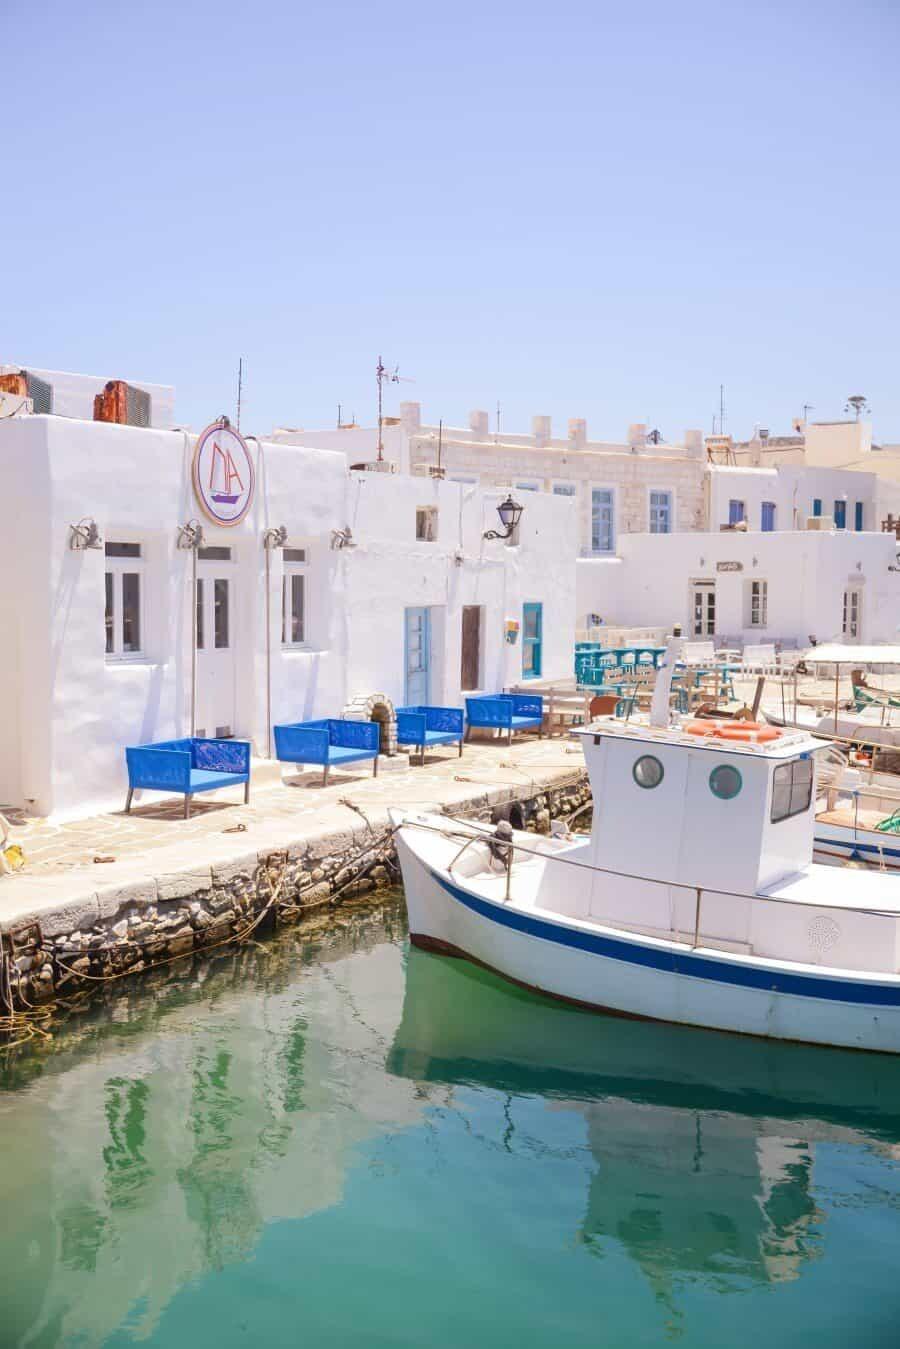 paros-island-greek-islands-by-the-wandering-lens-04